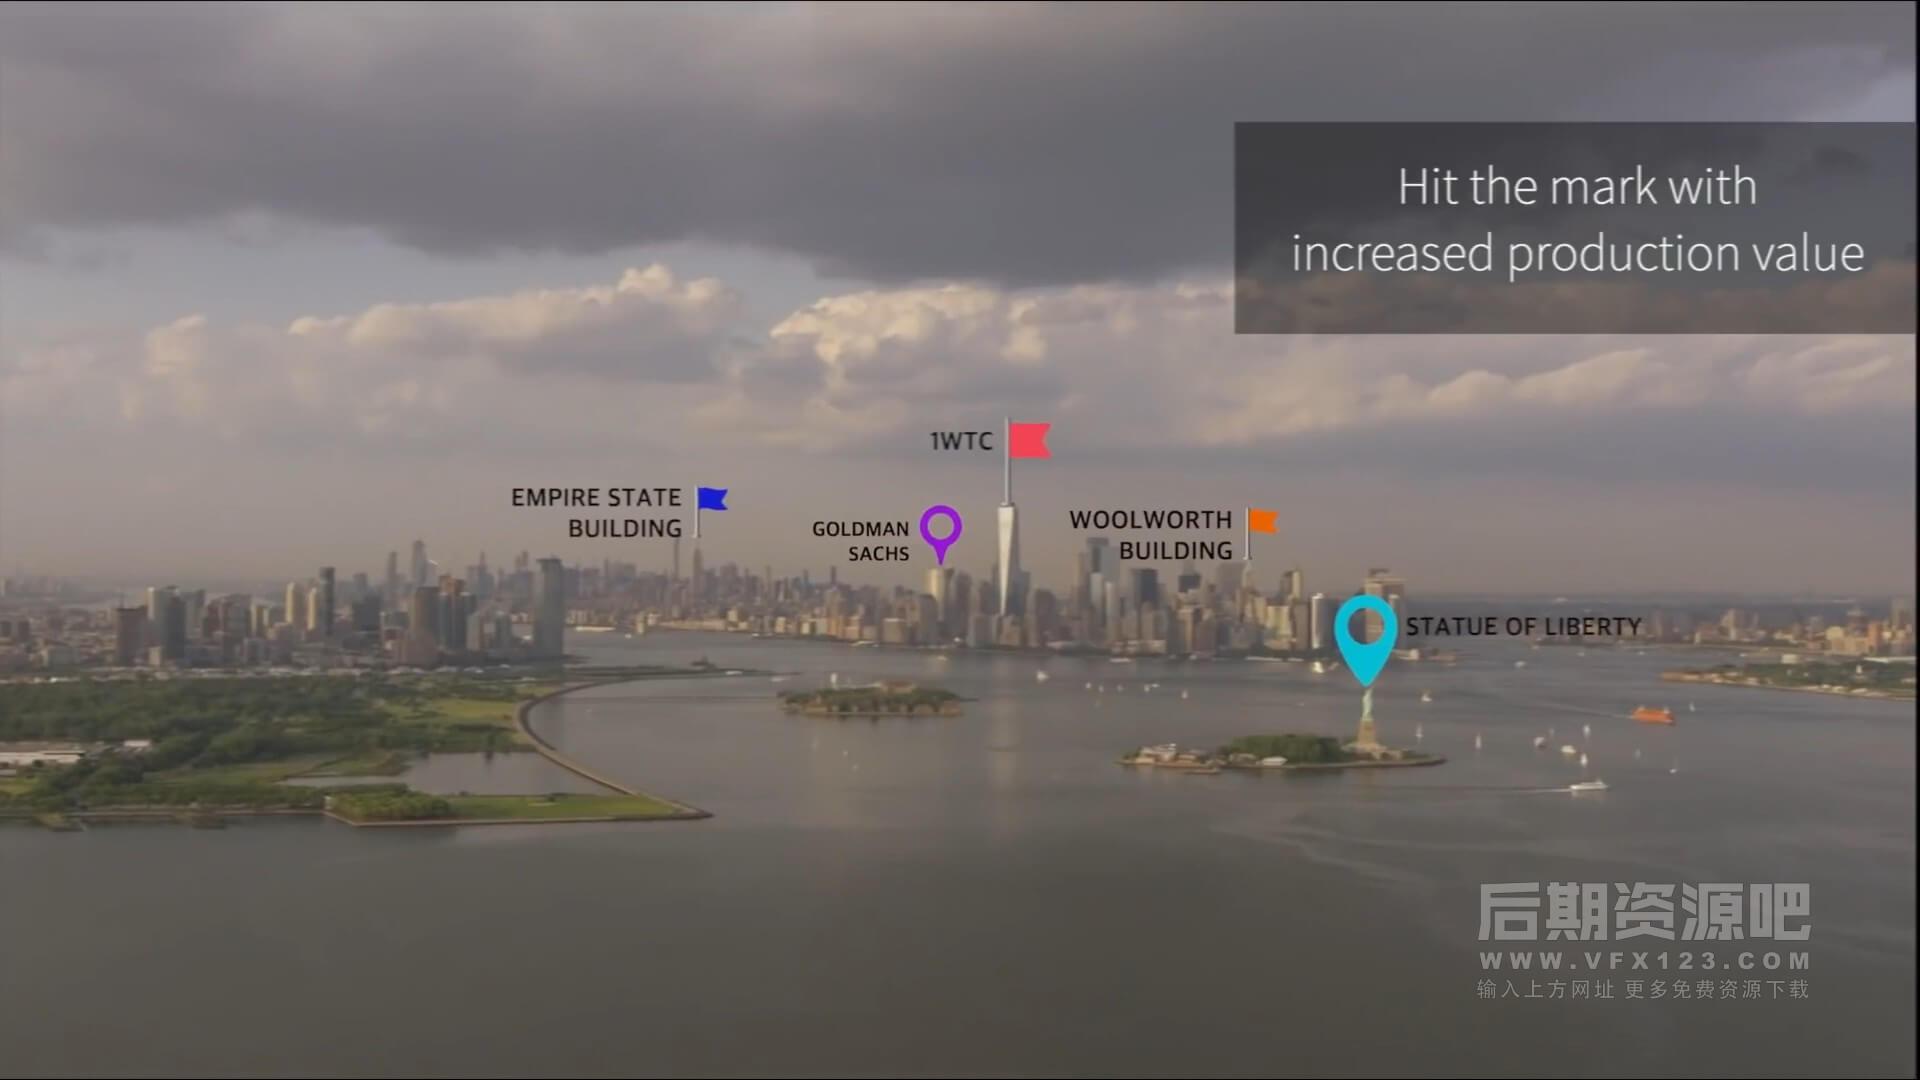 fcpx插件 105个自动跟踪标识地点标注位置气泡标题动画预设 Pointer Pop